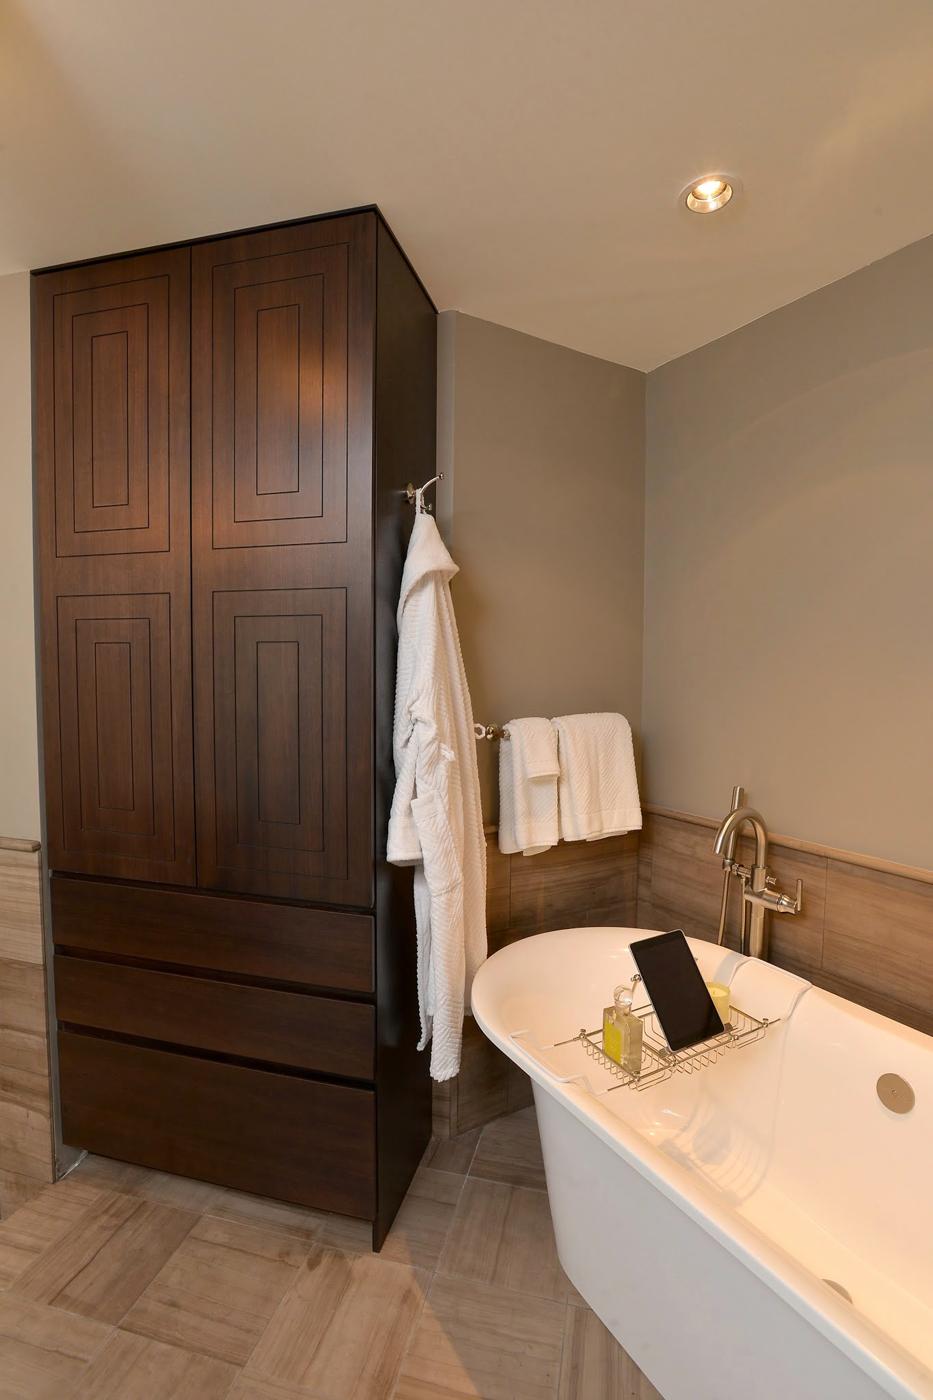 Custom master bathroom cabinetry with concentric rectangular box detail and Victoria + Albert bathtub | Savage Interior Design